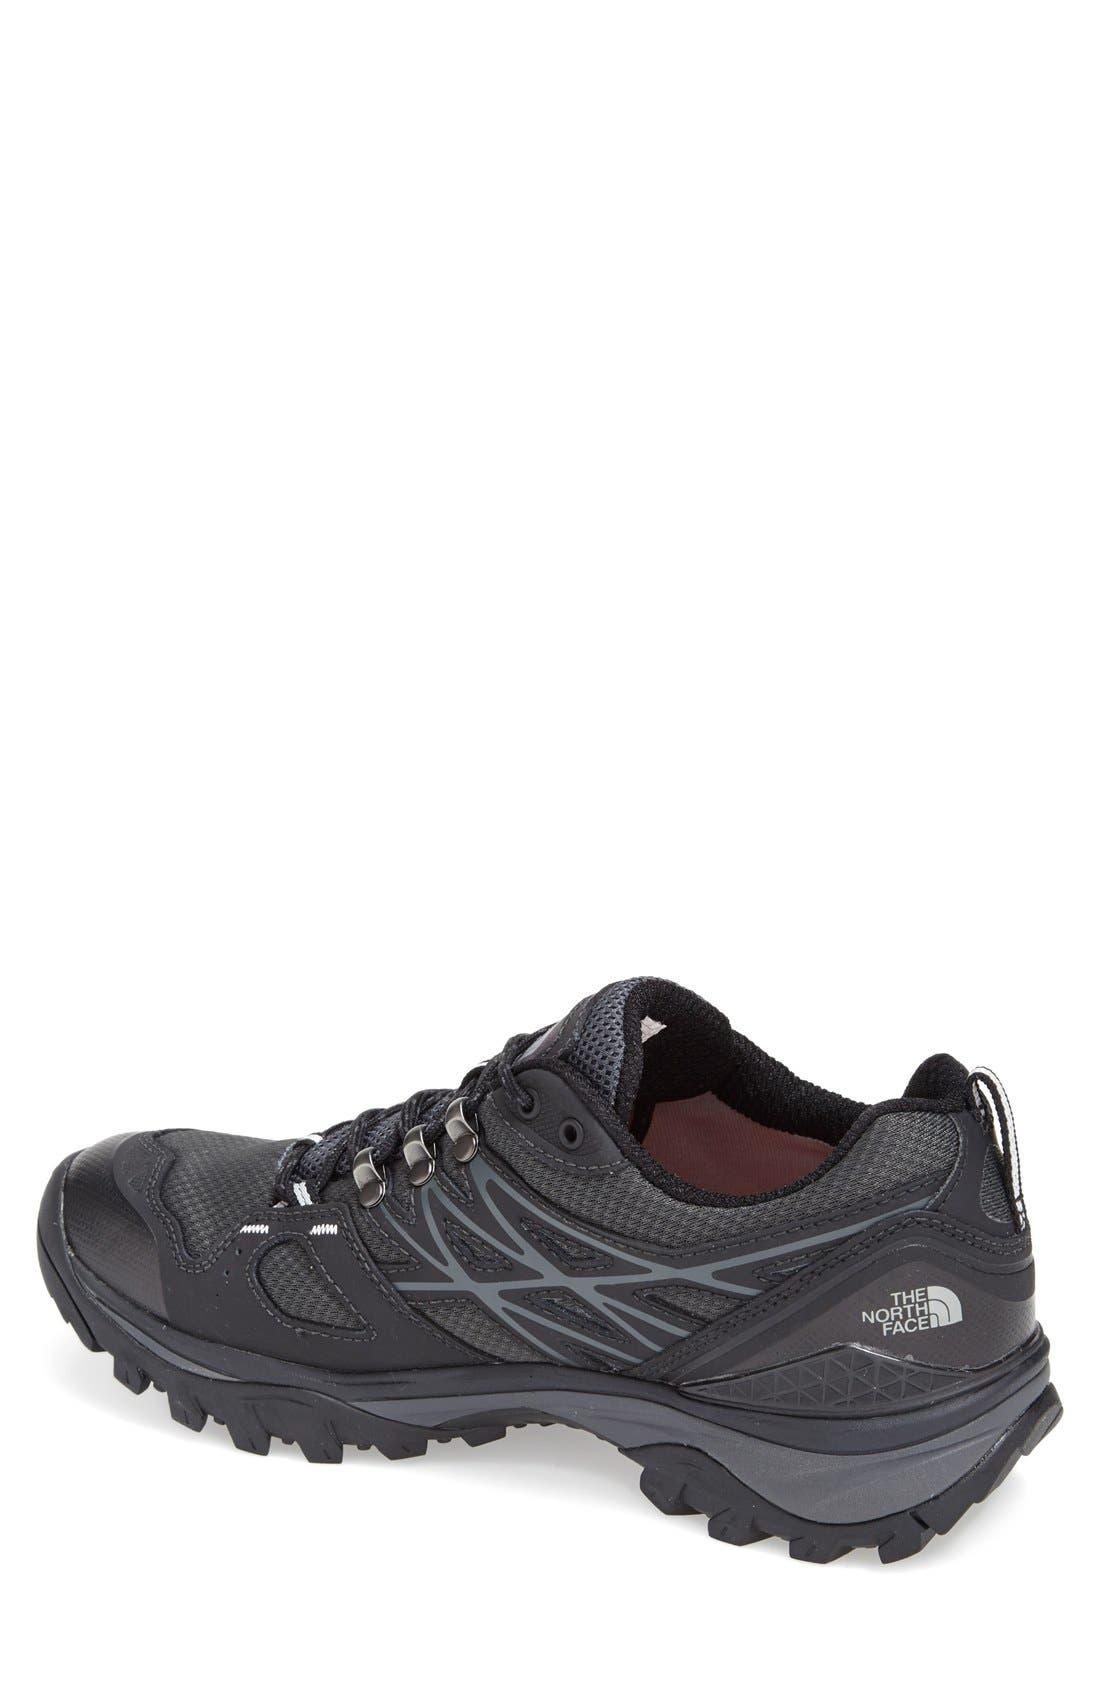 Alternate Image 2  - The North Face 'Hedgehog Fastpack' Gore-Tex® Waterproof Hiking Shoe (Men)